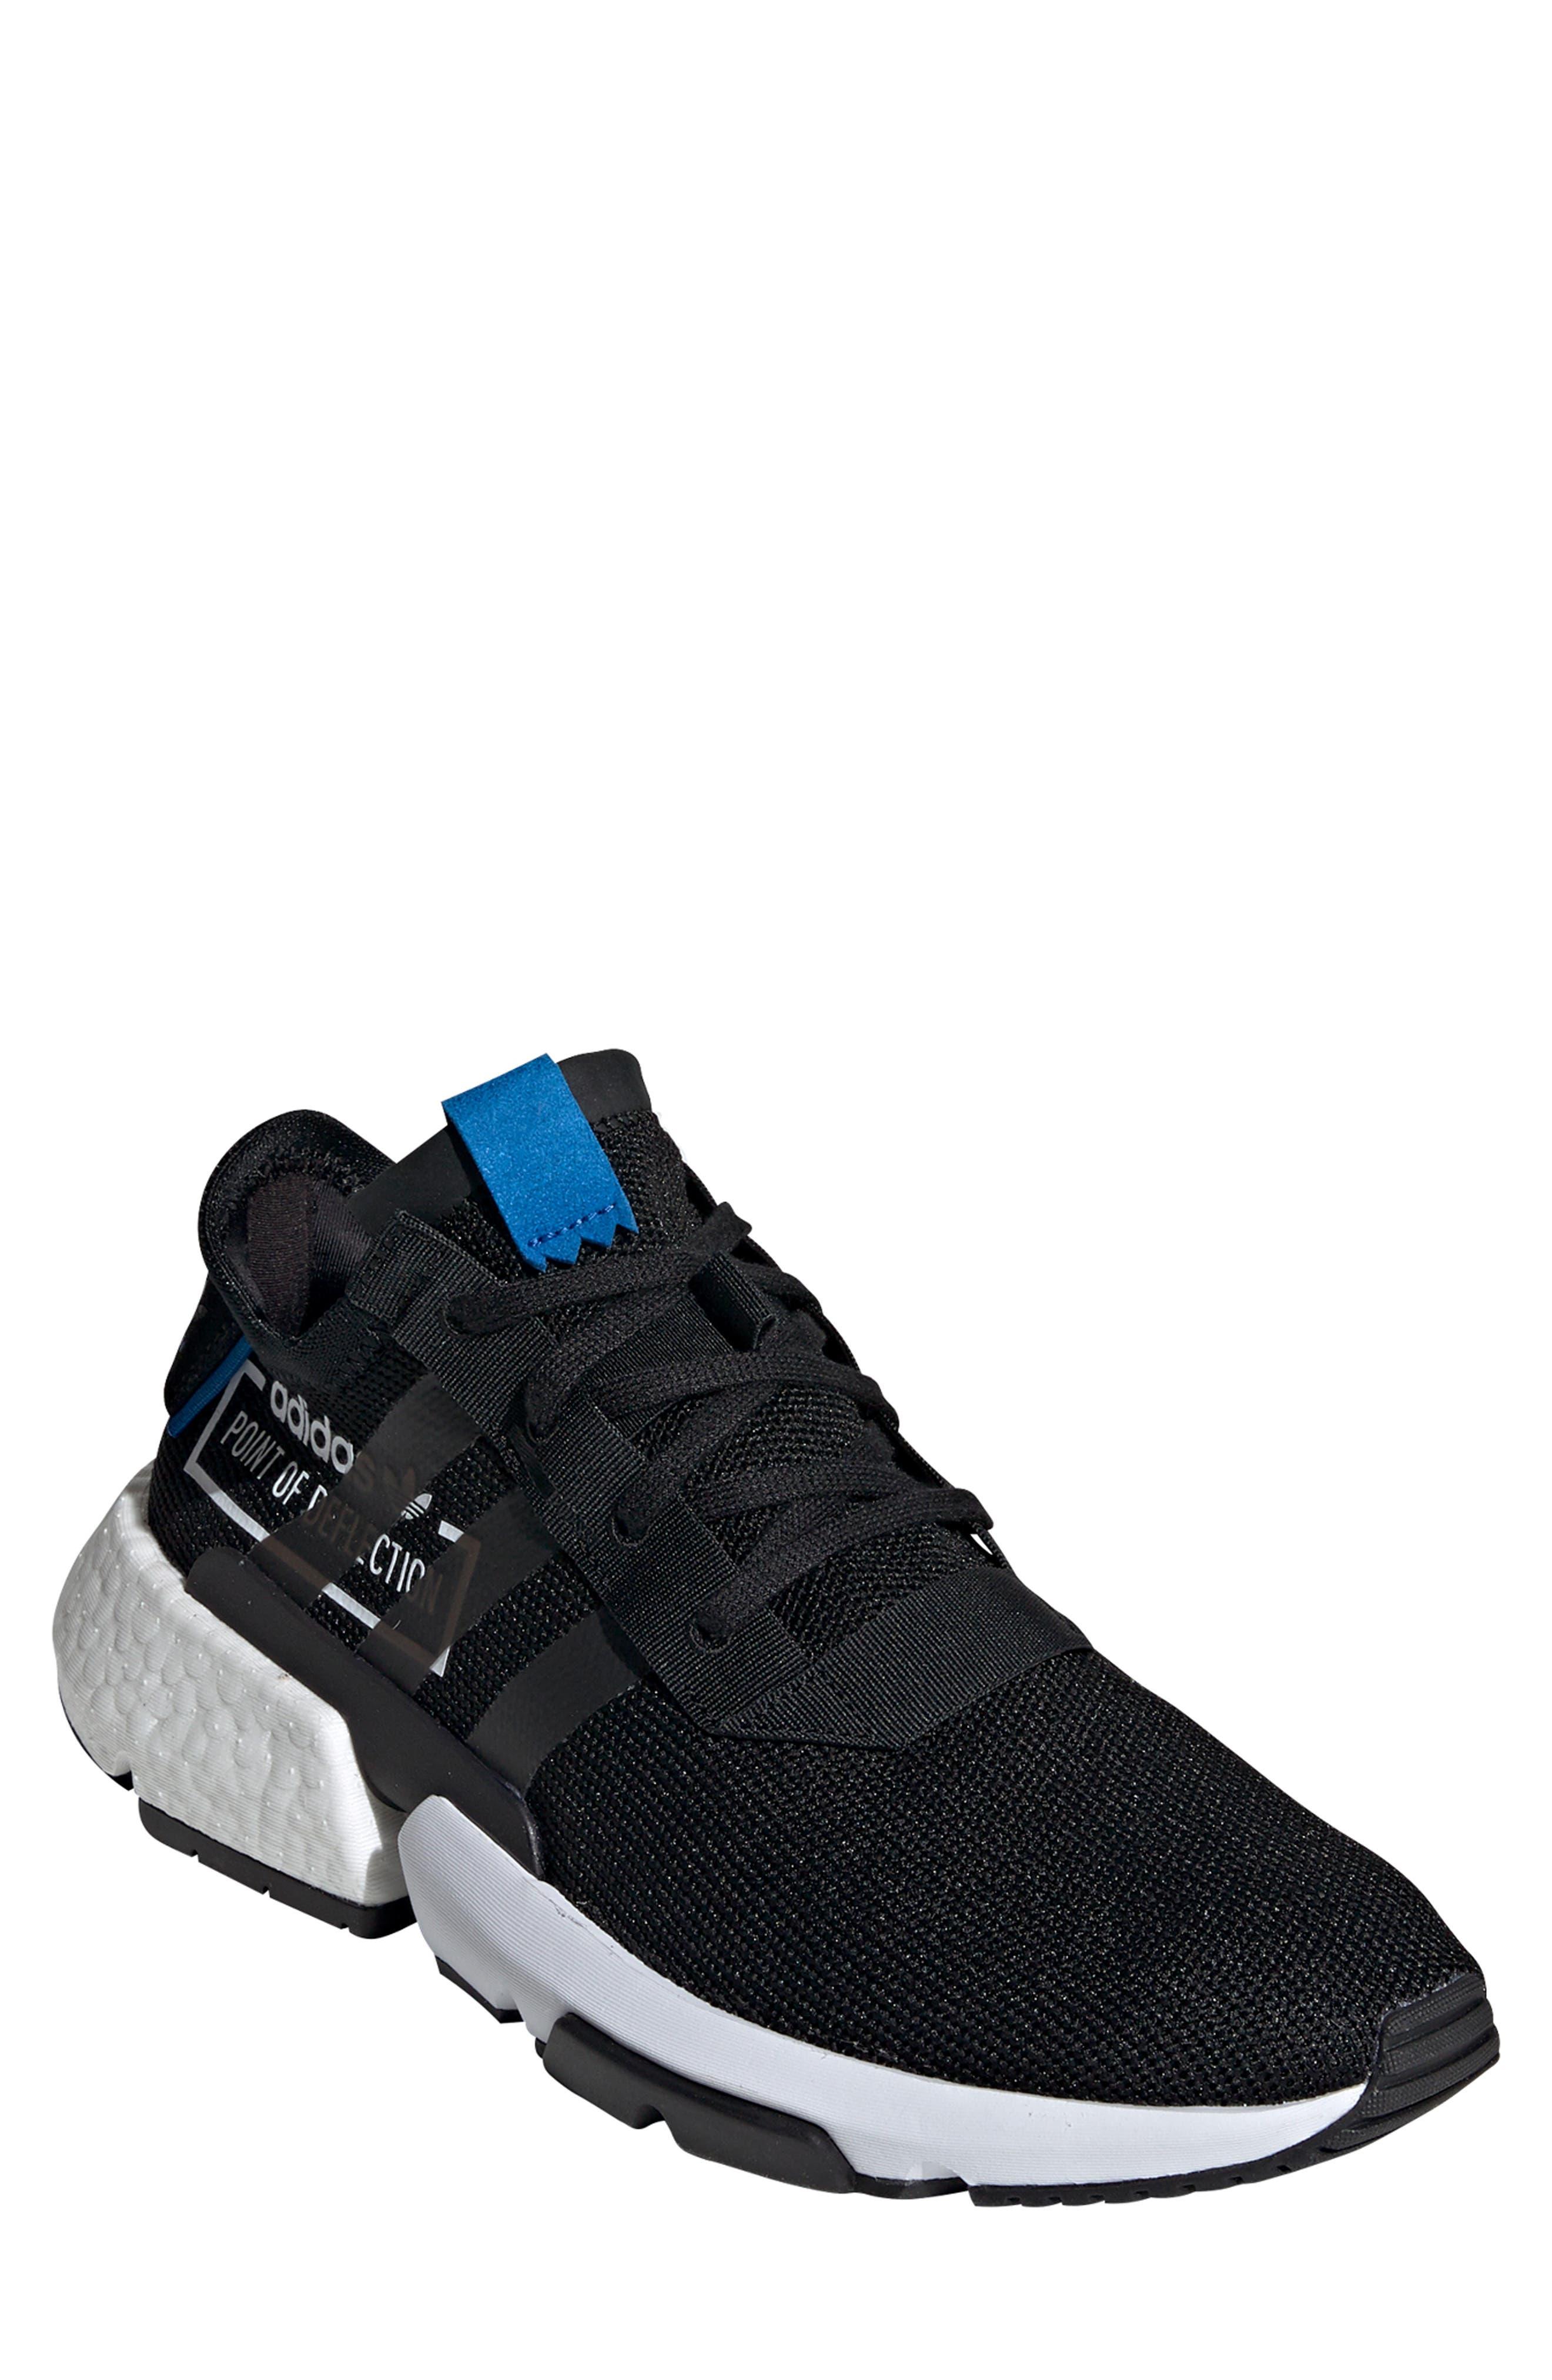 Pod S3.1 Sneaker,                             Main thumbnail 1, color,                             BLACK/ BLACK/ BLUEBIRD